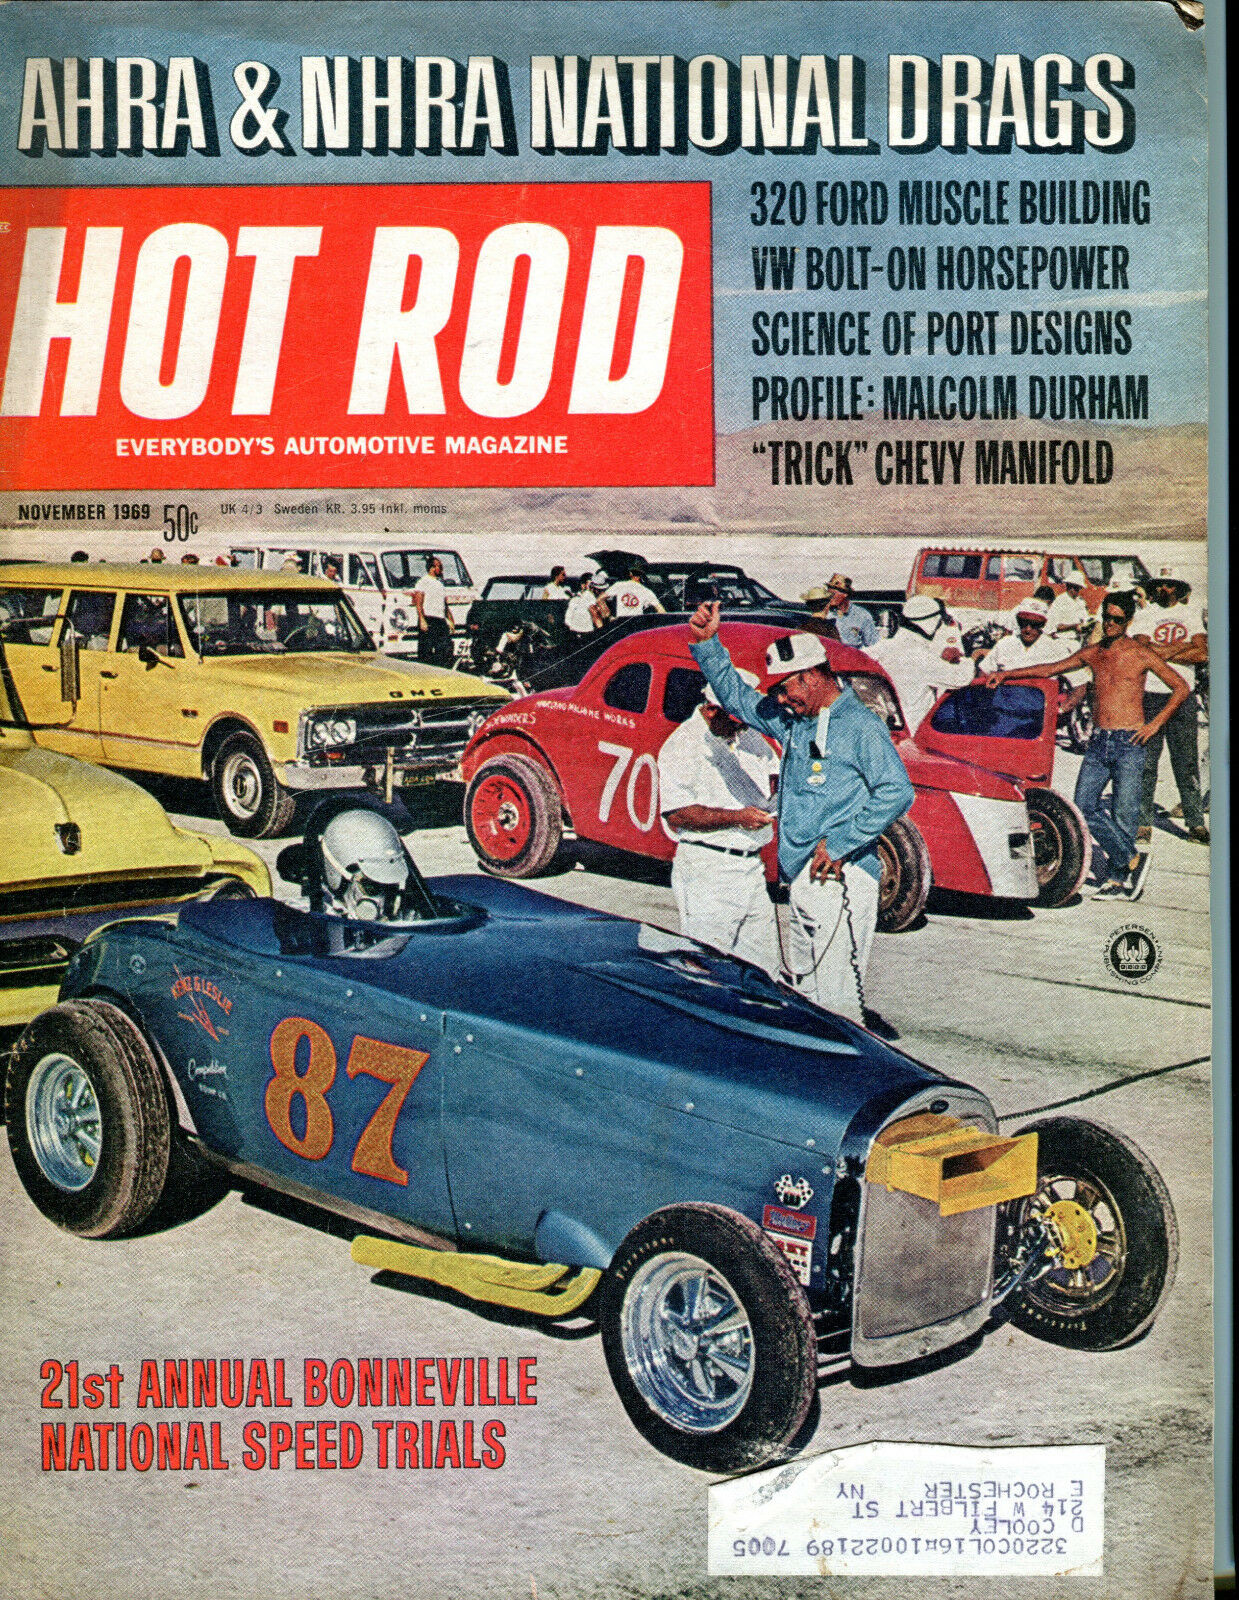 Hot Rod - November, 1969 Back Issue | eBay